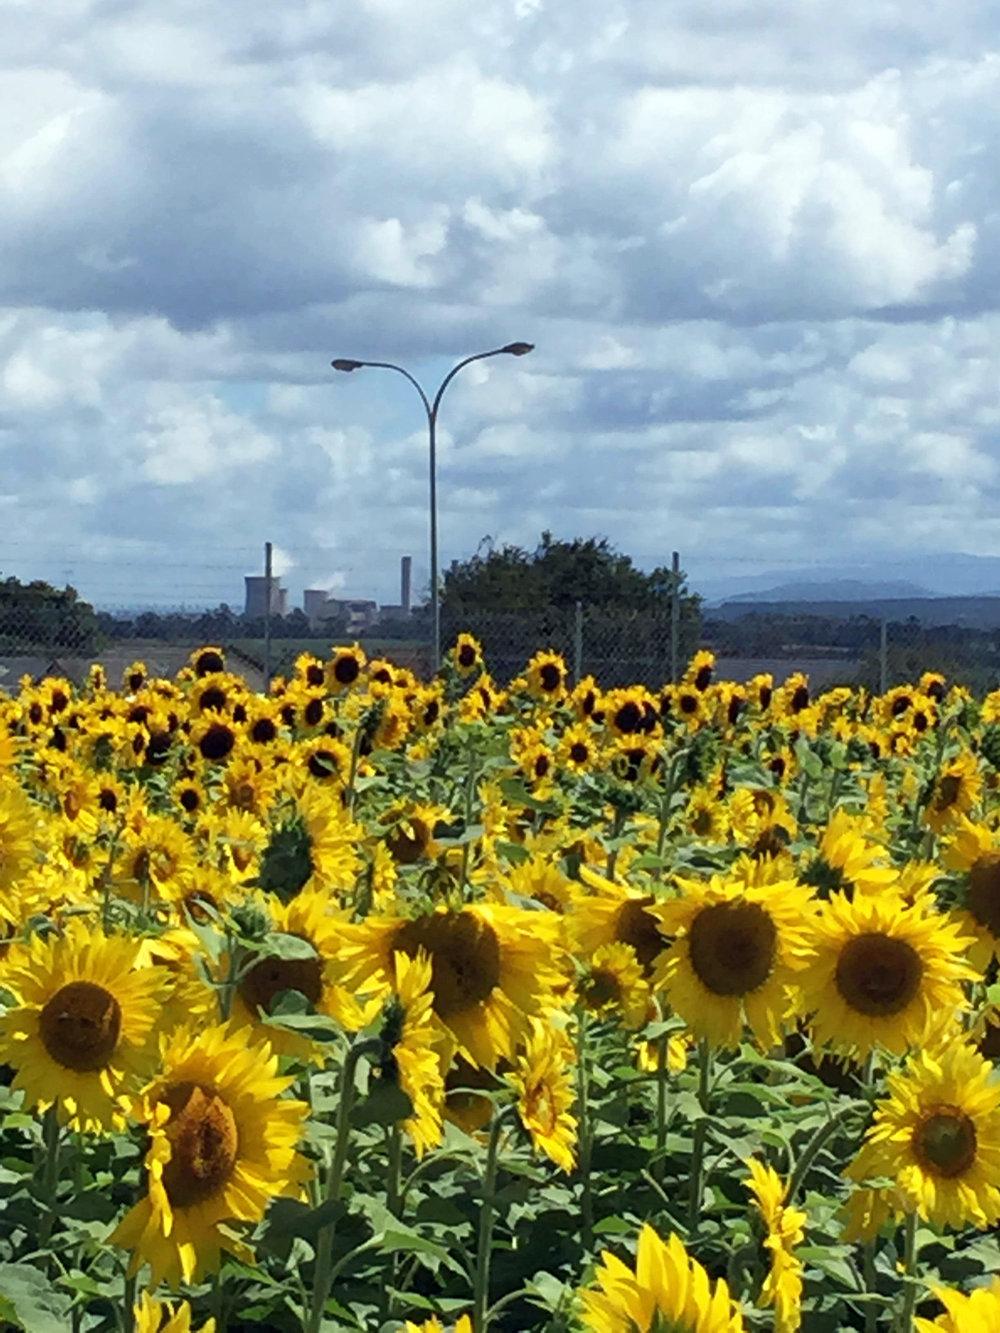 Get Sunflowered_Morwell-Church St 01.jpg